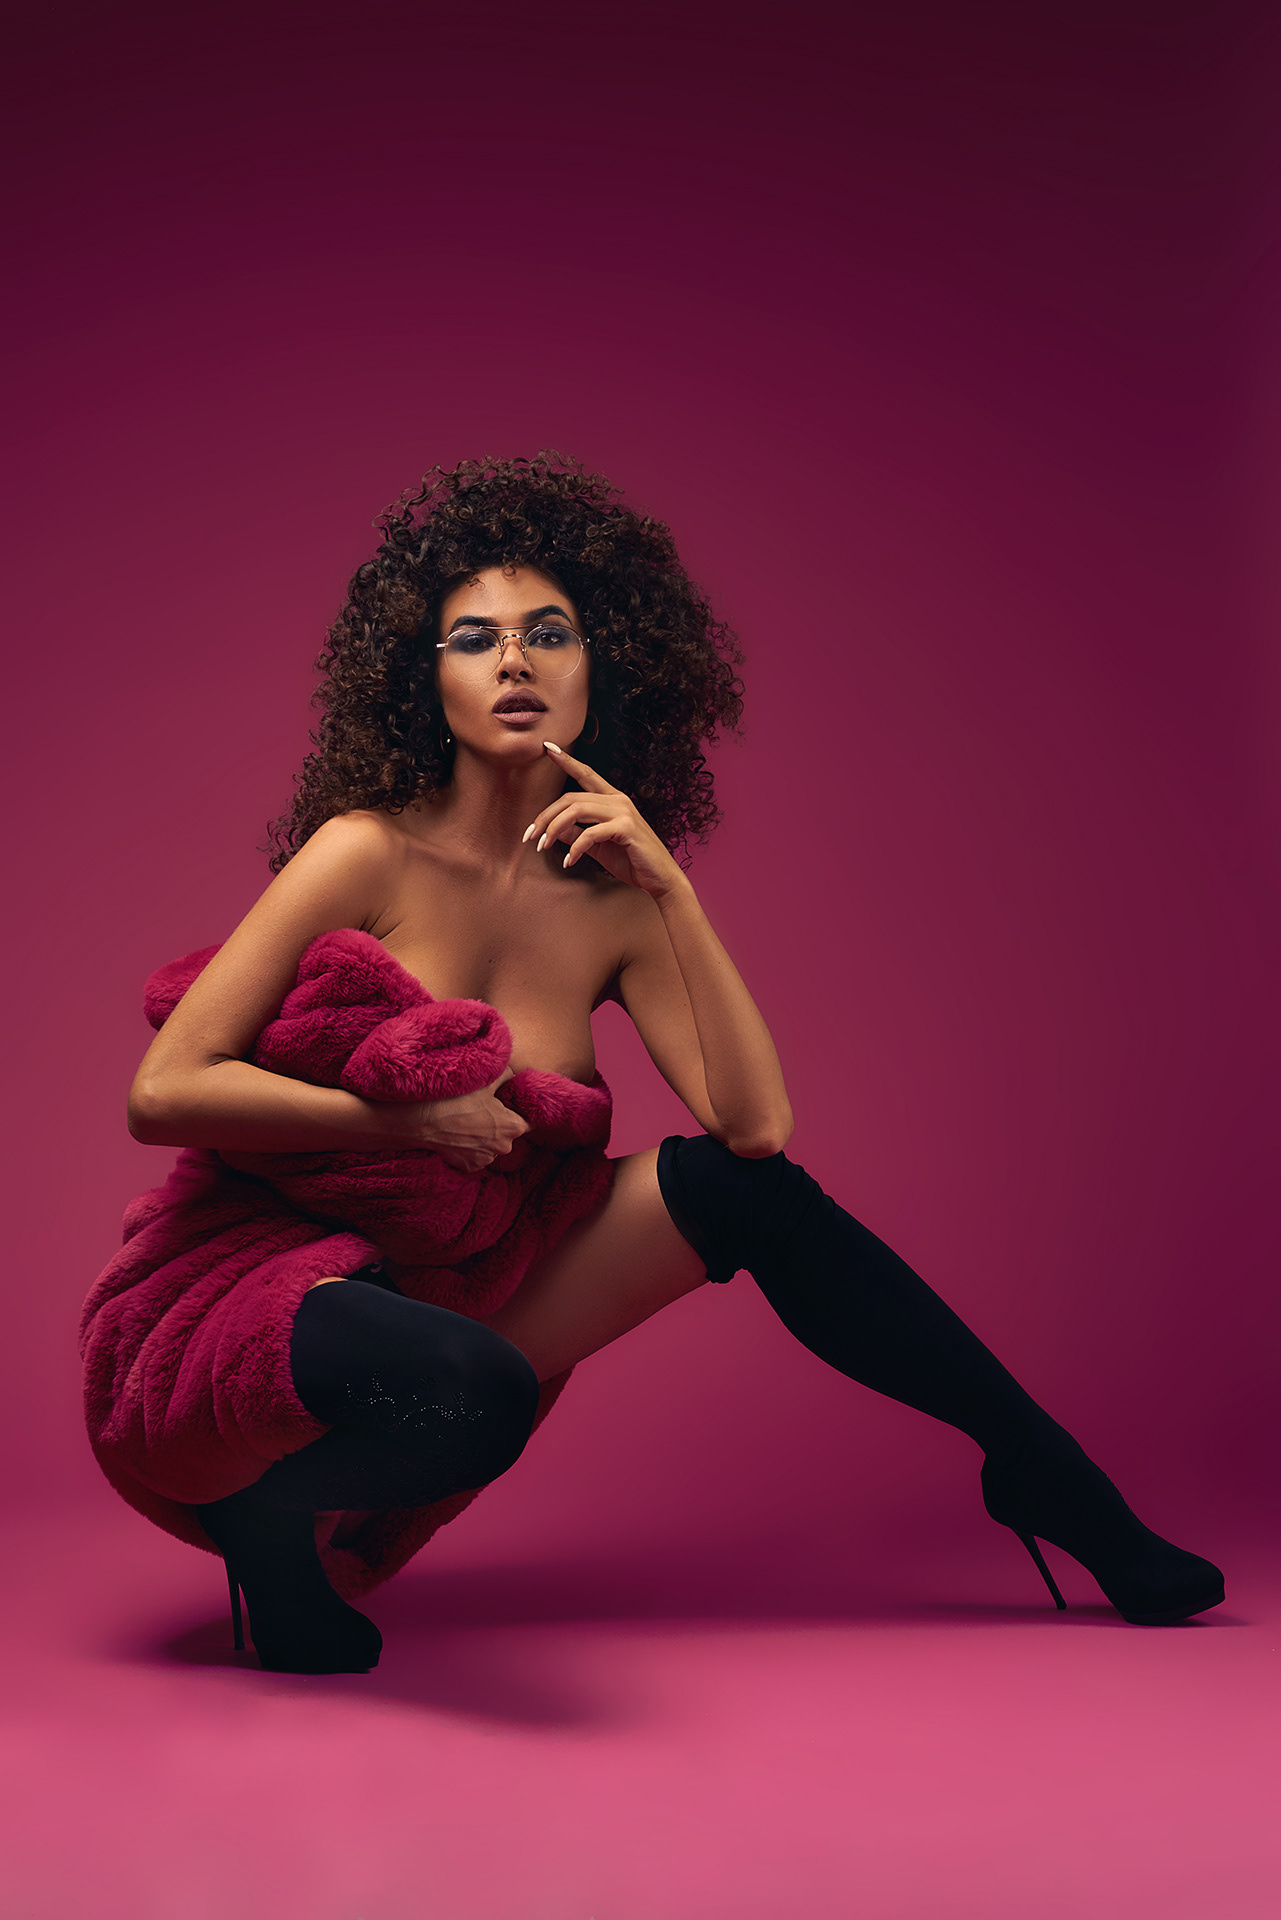 Color princess / фото Артур Каплун